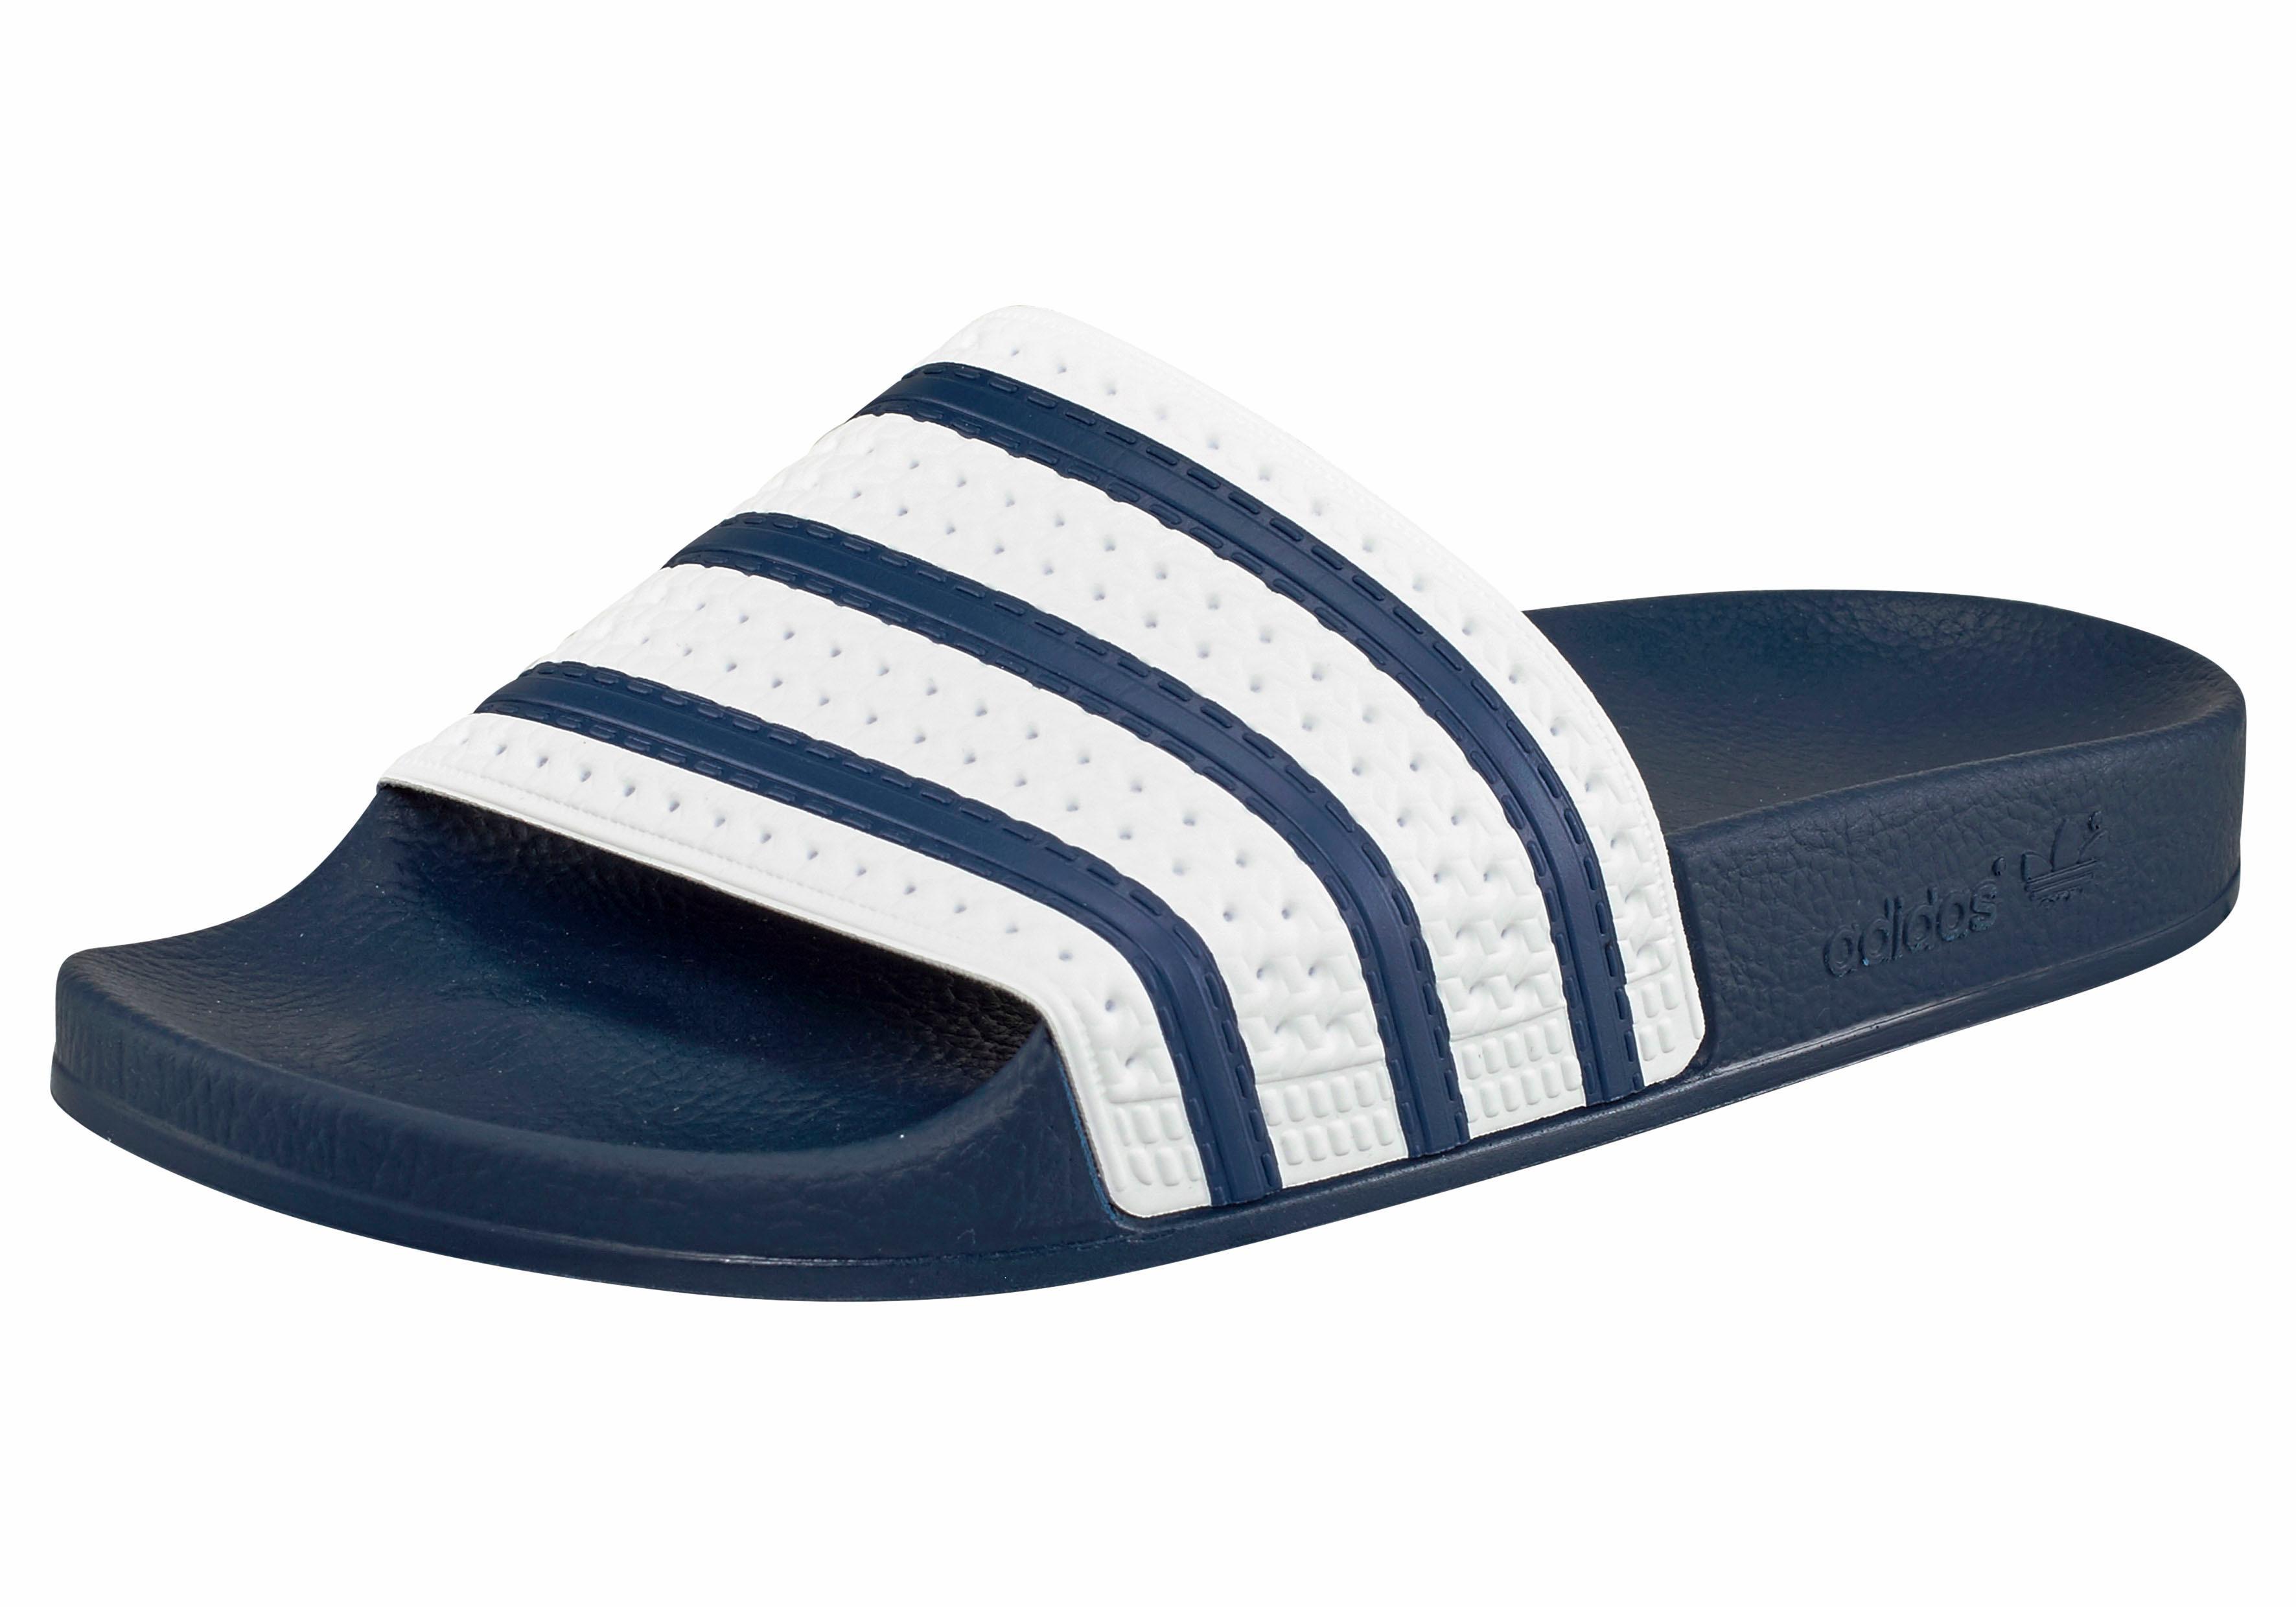 154308b2a7b adidas Originals Badesandale »Adilette« online bestellen